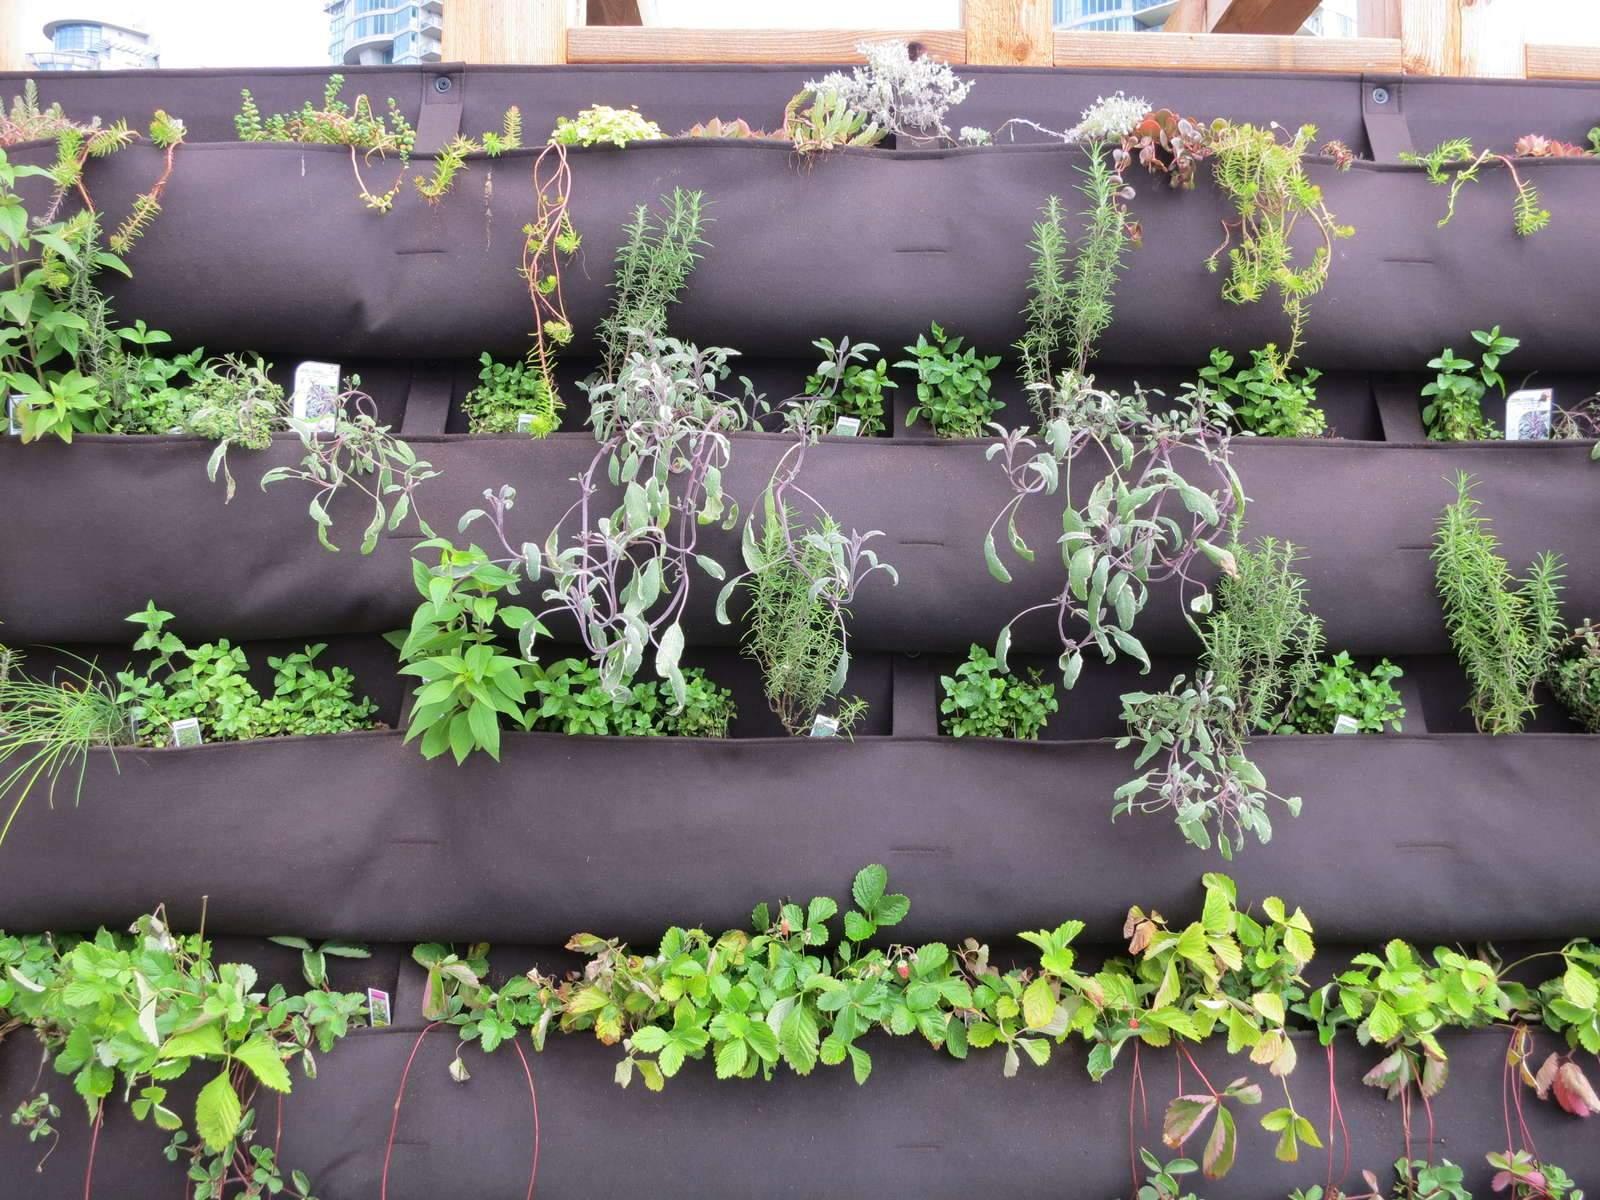 Vertikaler Garten Inspirierend Vertikaler Garten Gärten Bis In Luftige Höhen Anlegen